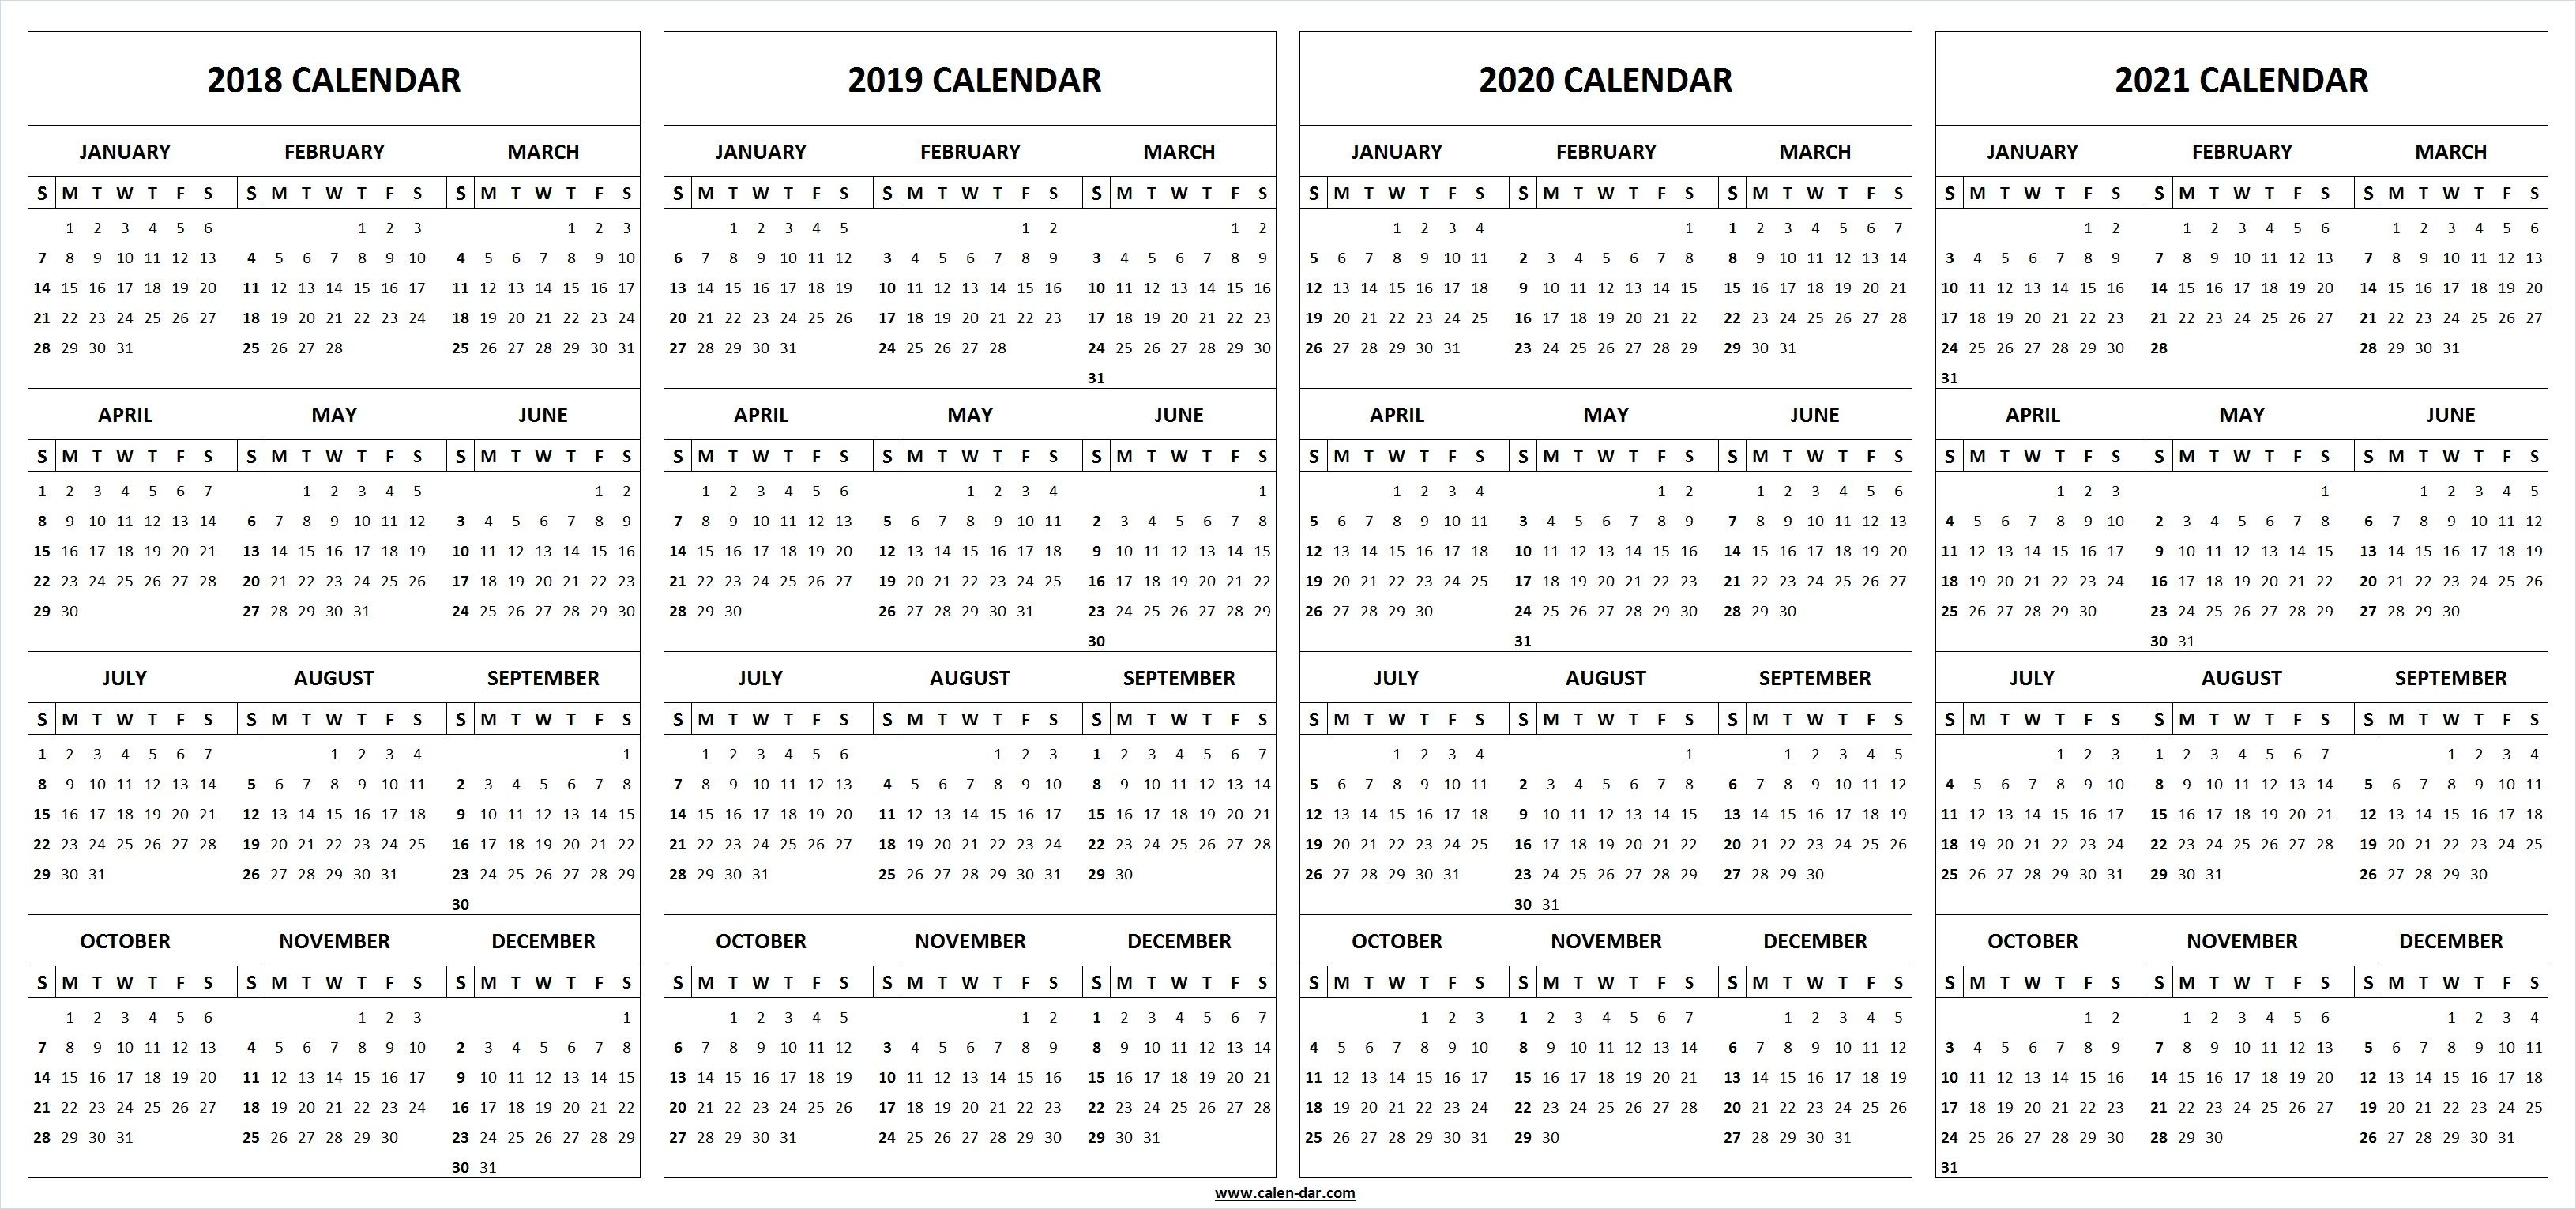 Extraordinary 3 Year Printable Calendar 2019 To 2020 • Printable in 3 Year Calendar Printable 2018 2019 2020